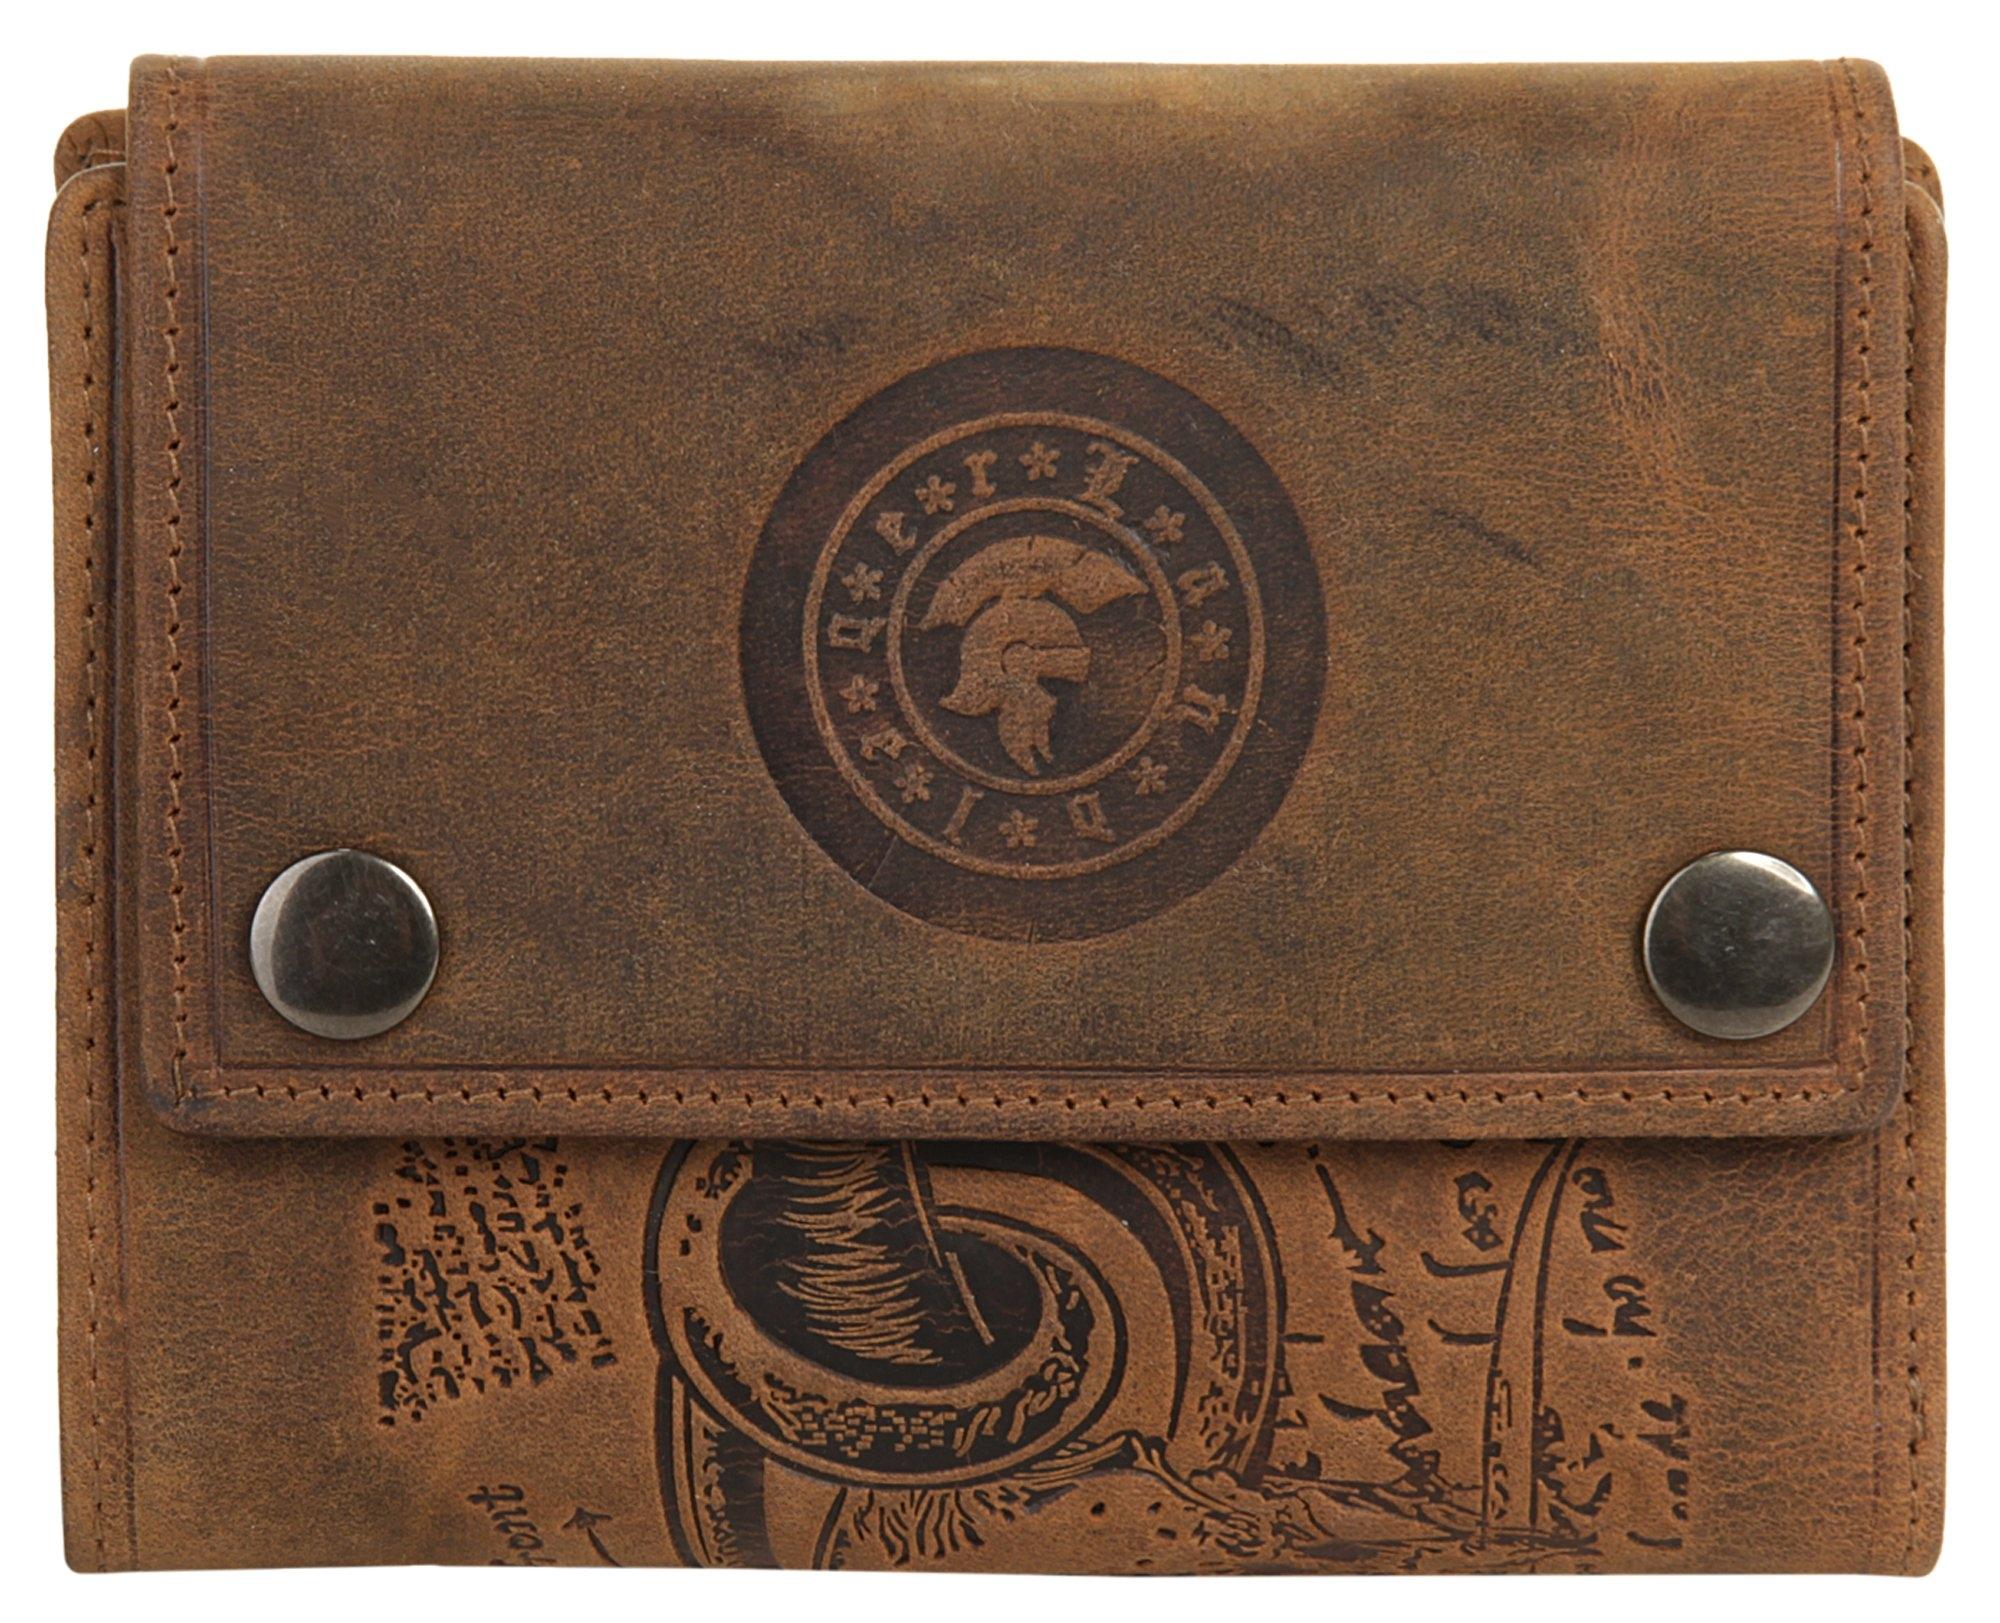 Landleder portemonnee Fotovak (1-delig) voordelig en veilig online kopen